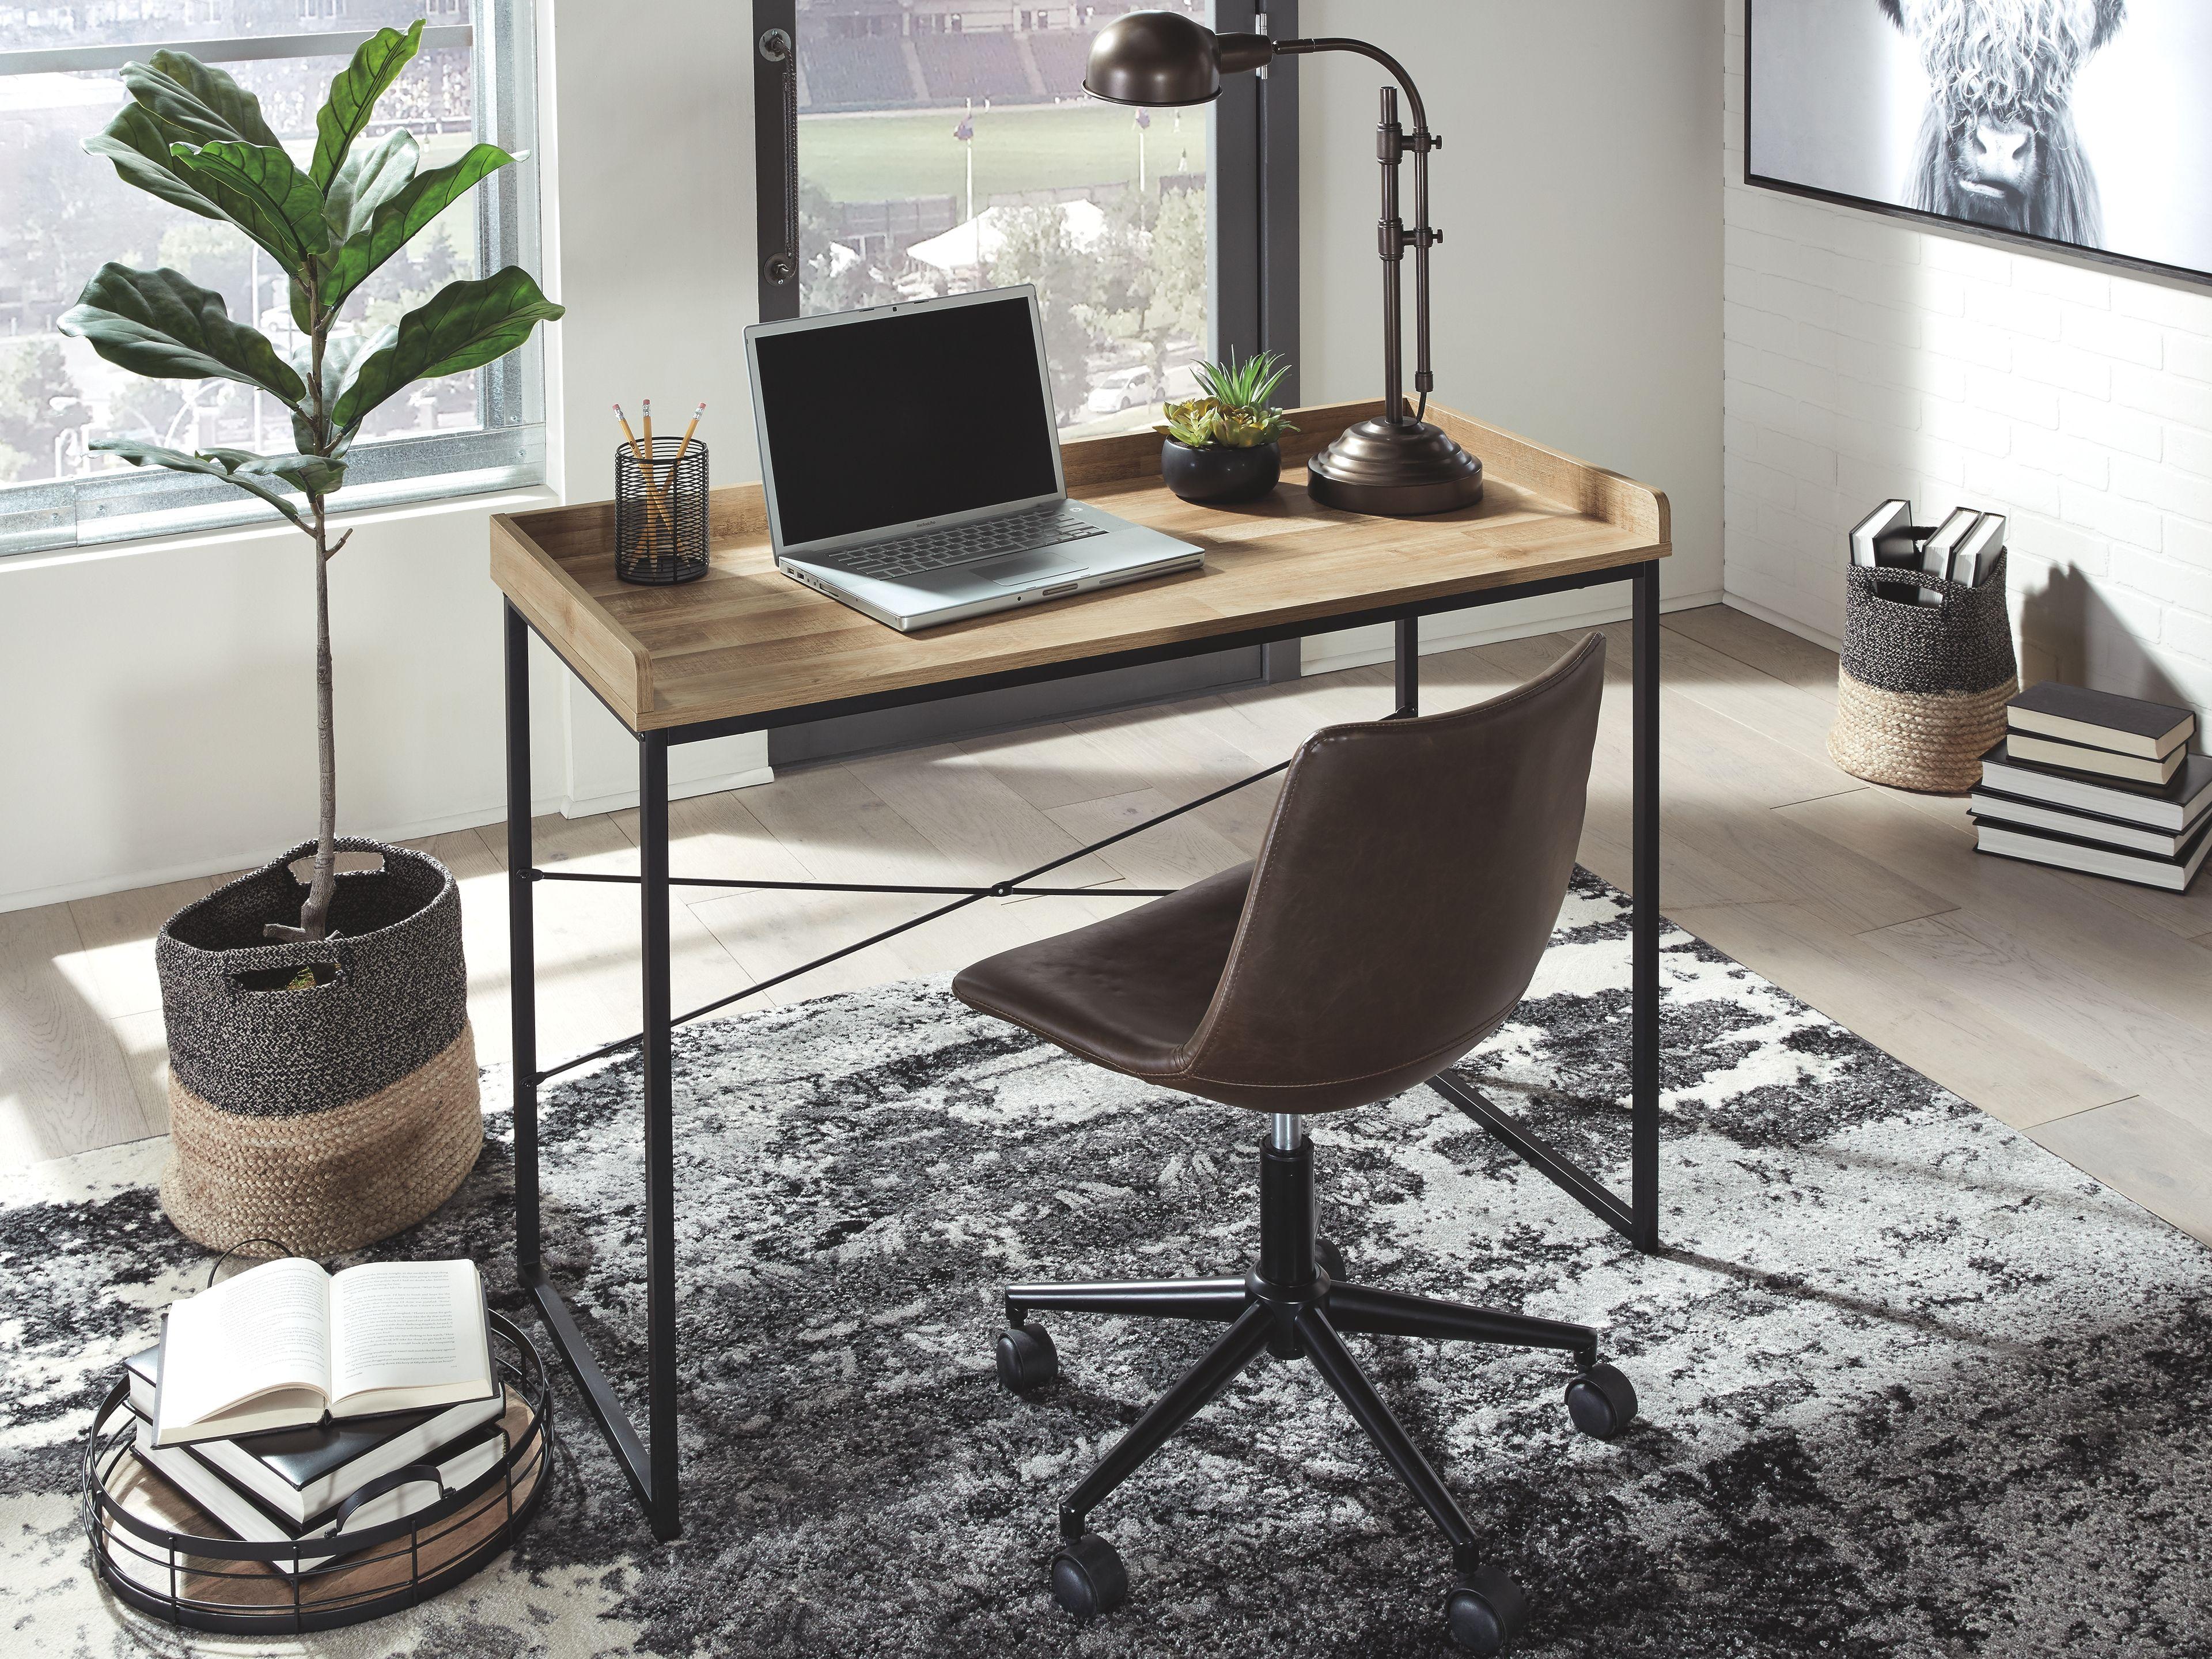 Gerdanet 43 Home Office Desk Ashley Furniture Homestore Home Office Furniture Desk Cheap Office Furniture Home Office Desks